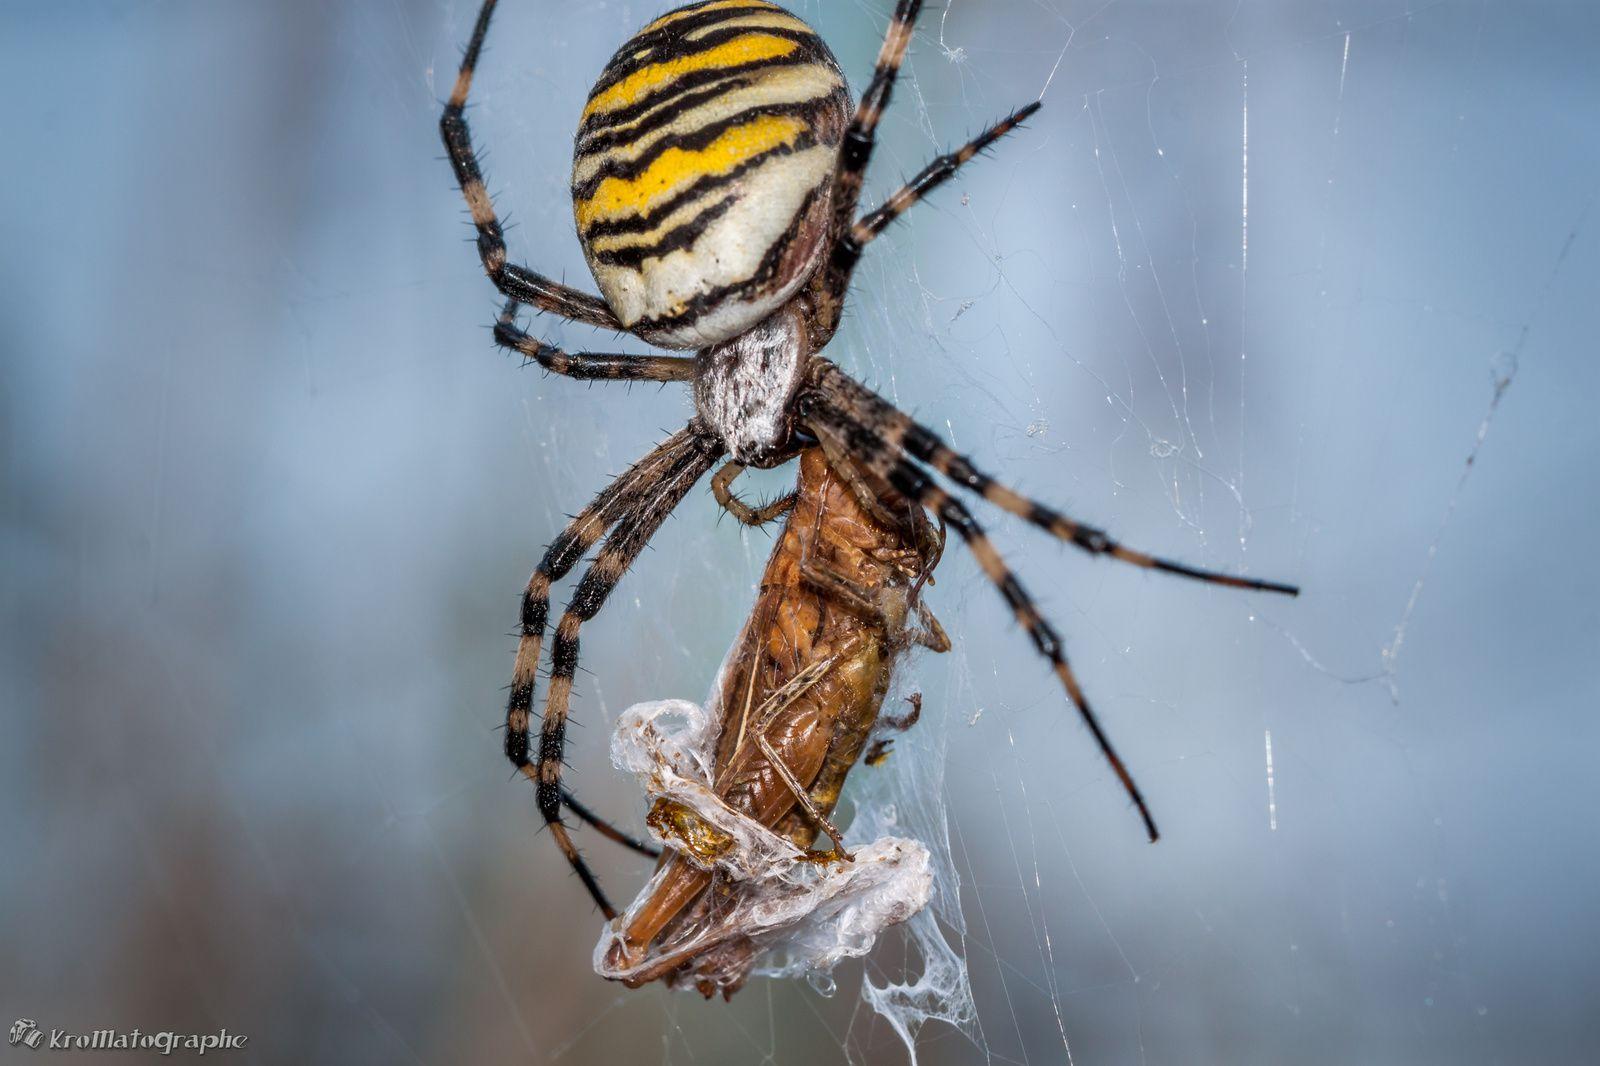 Araignée Argiope, le retour